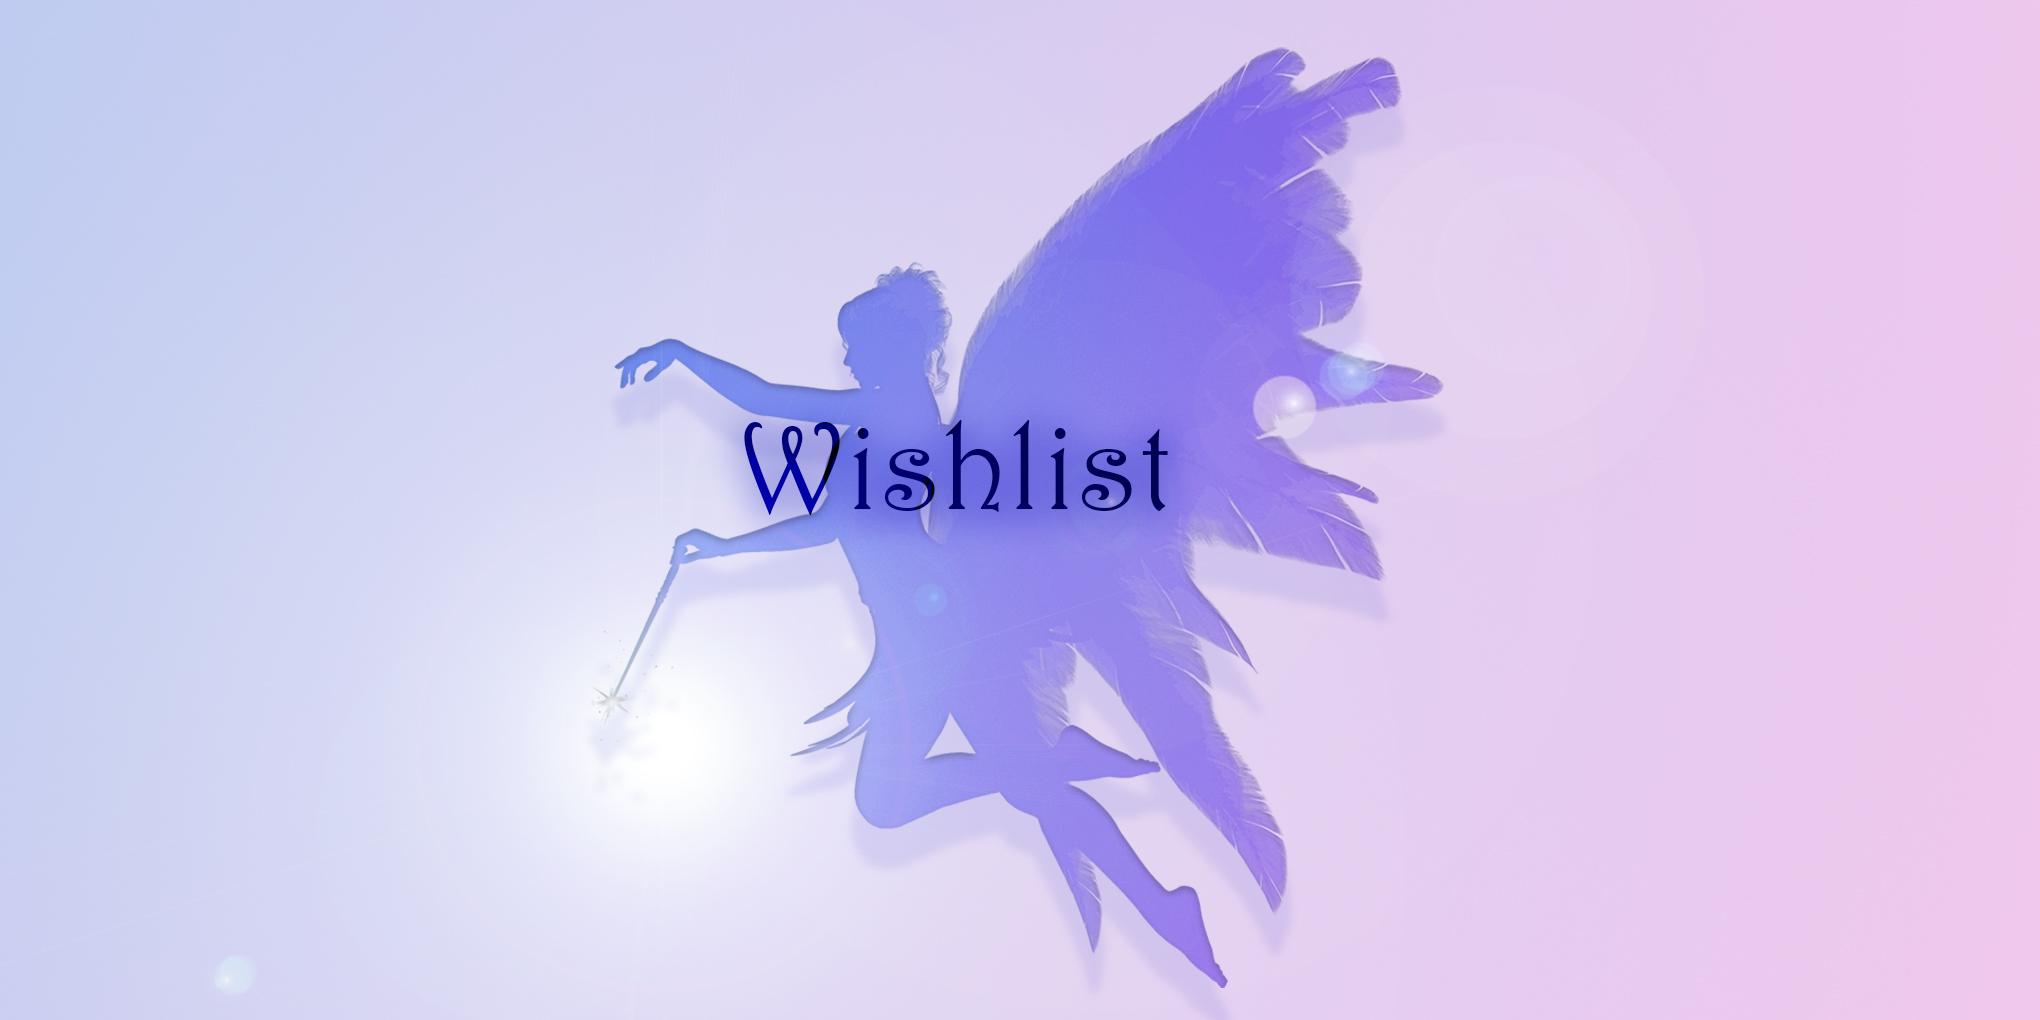 ahop-wishlist